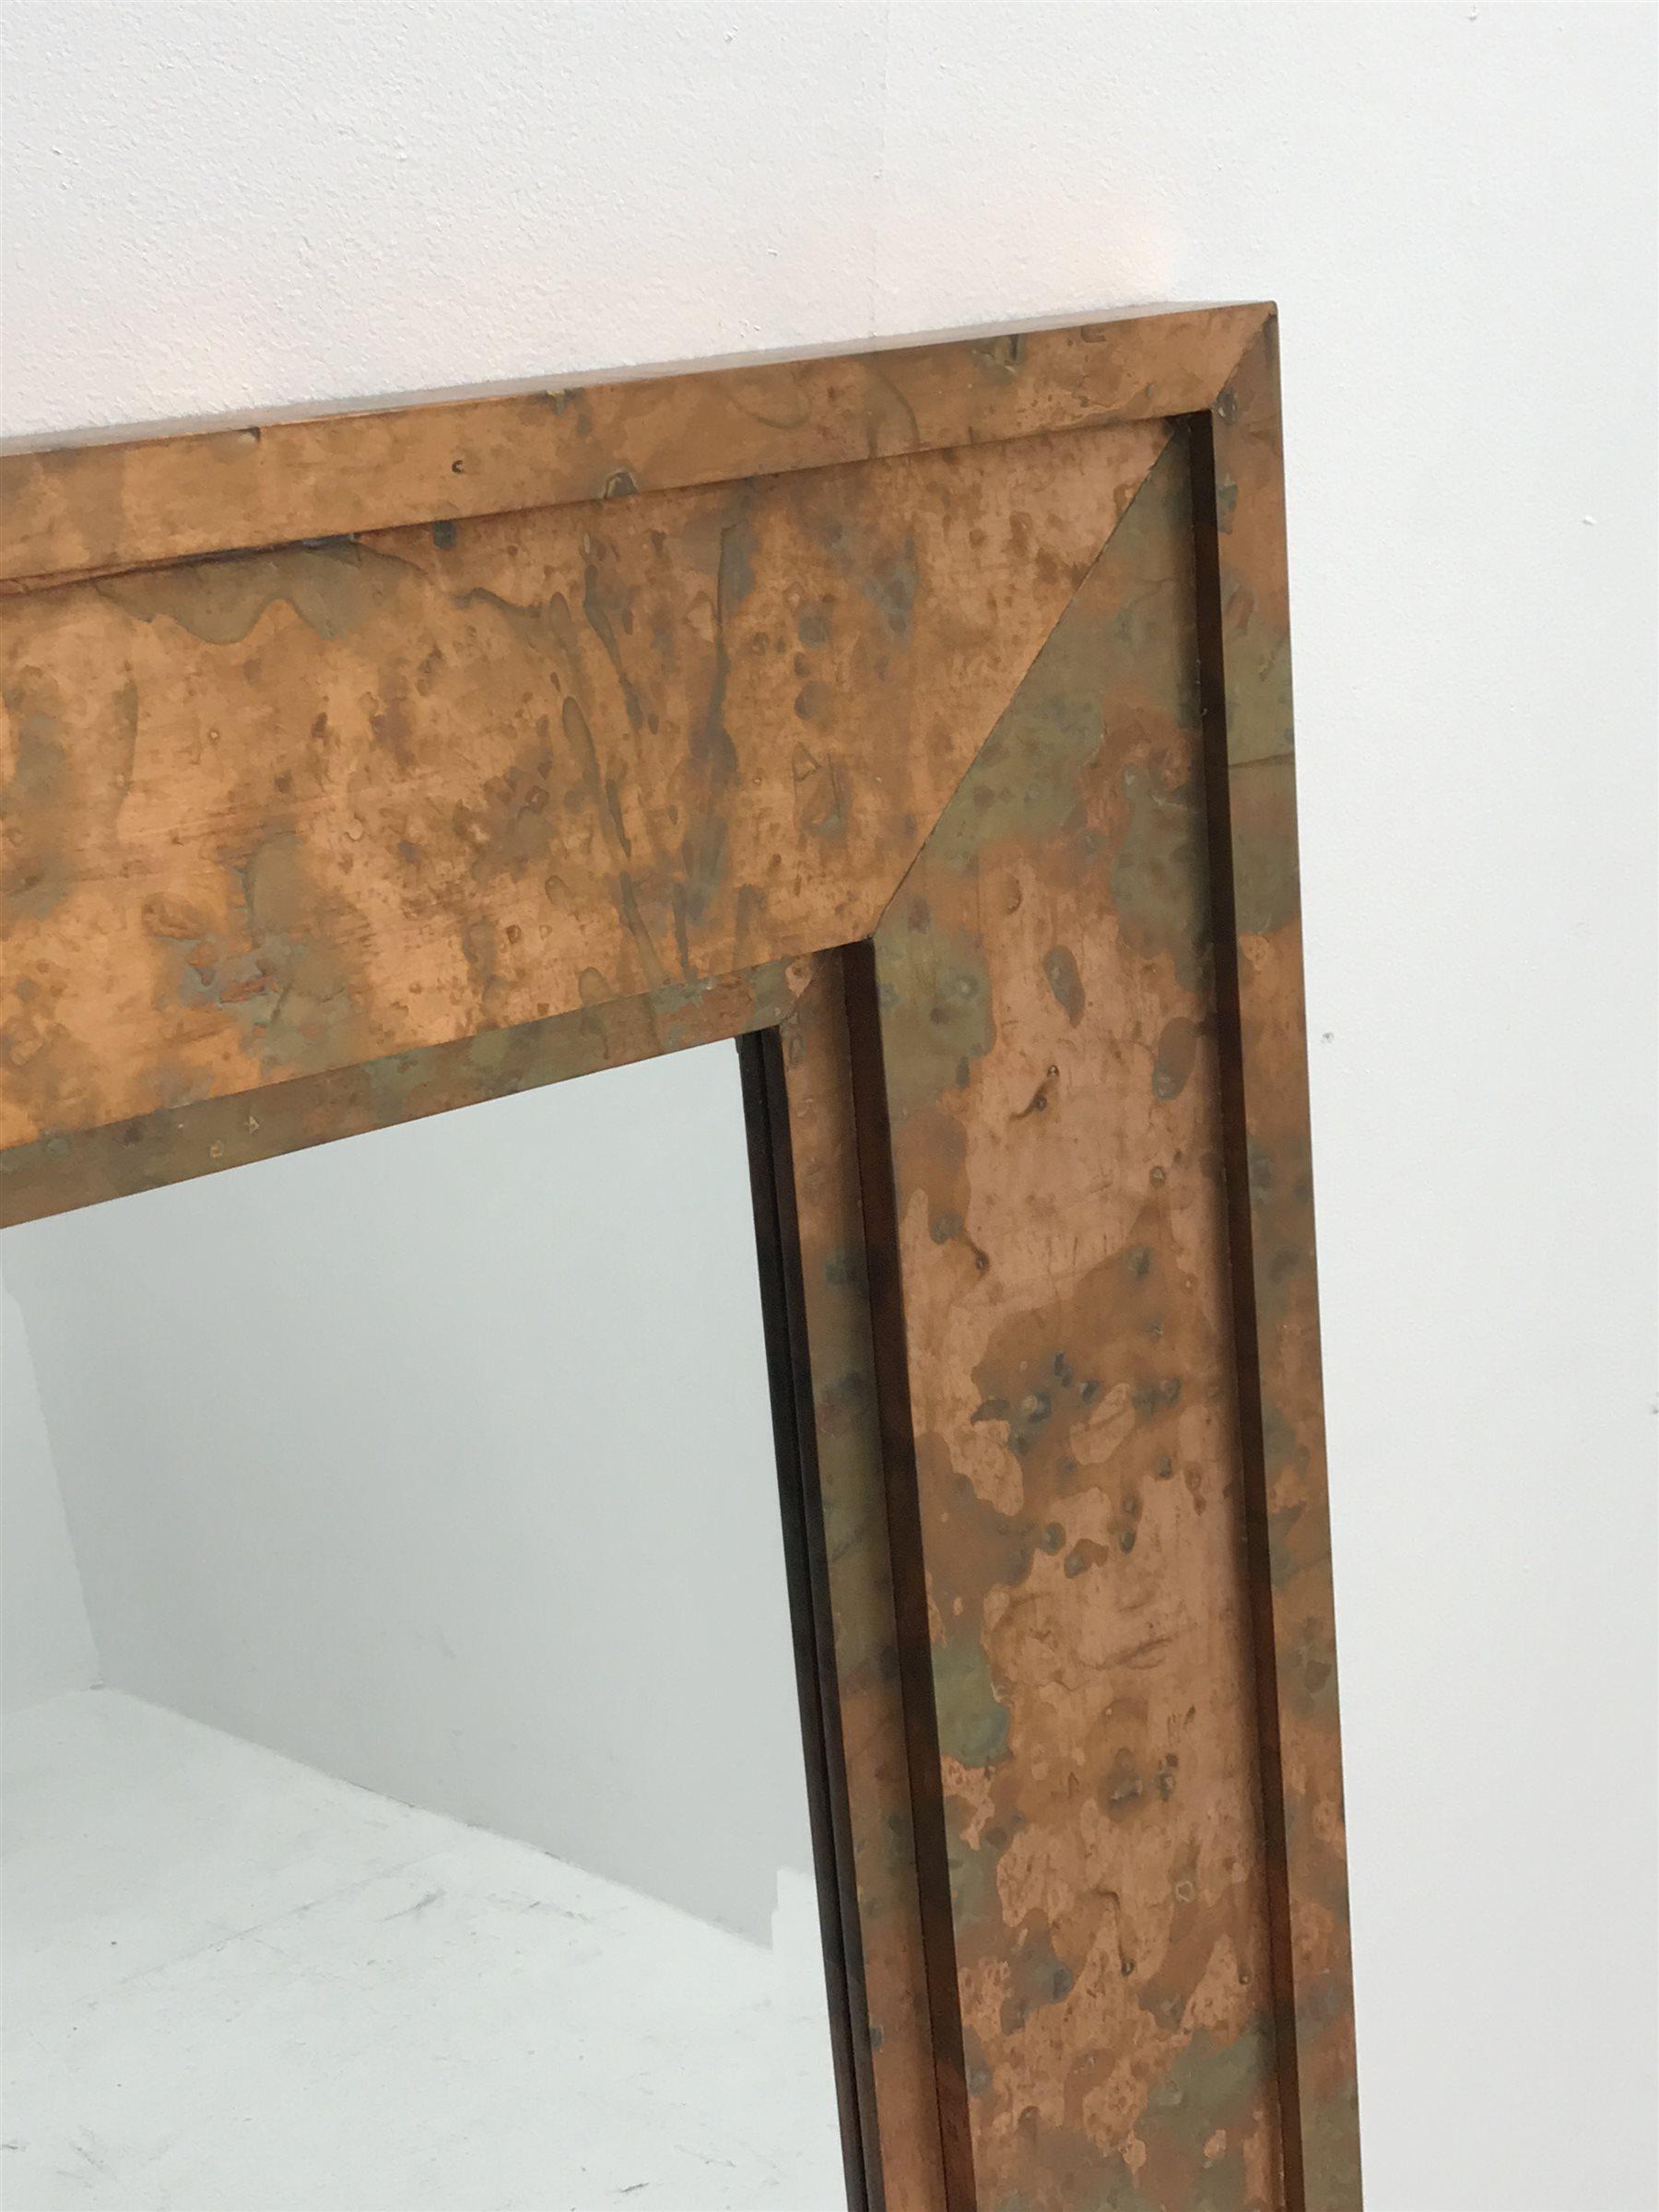 Acid washed copper framed rectangular wall mirror, bevelled plate, 91cm x 122cm - Image 2 of 2